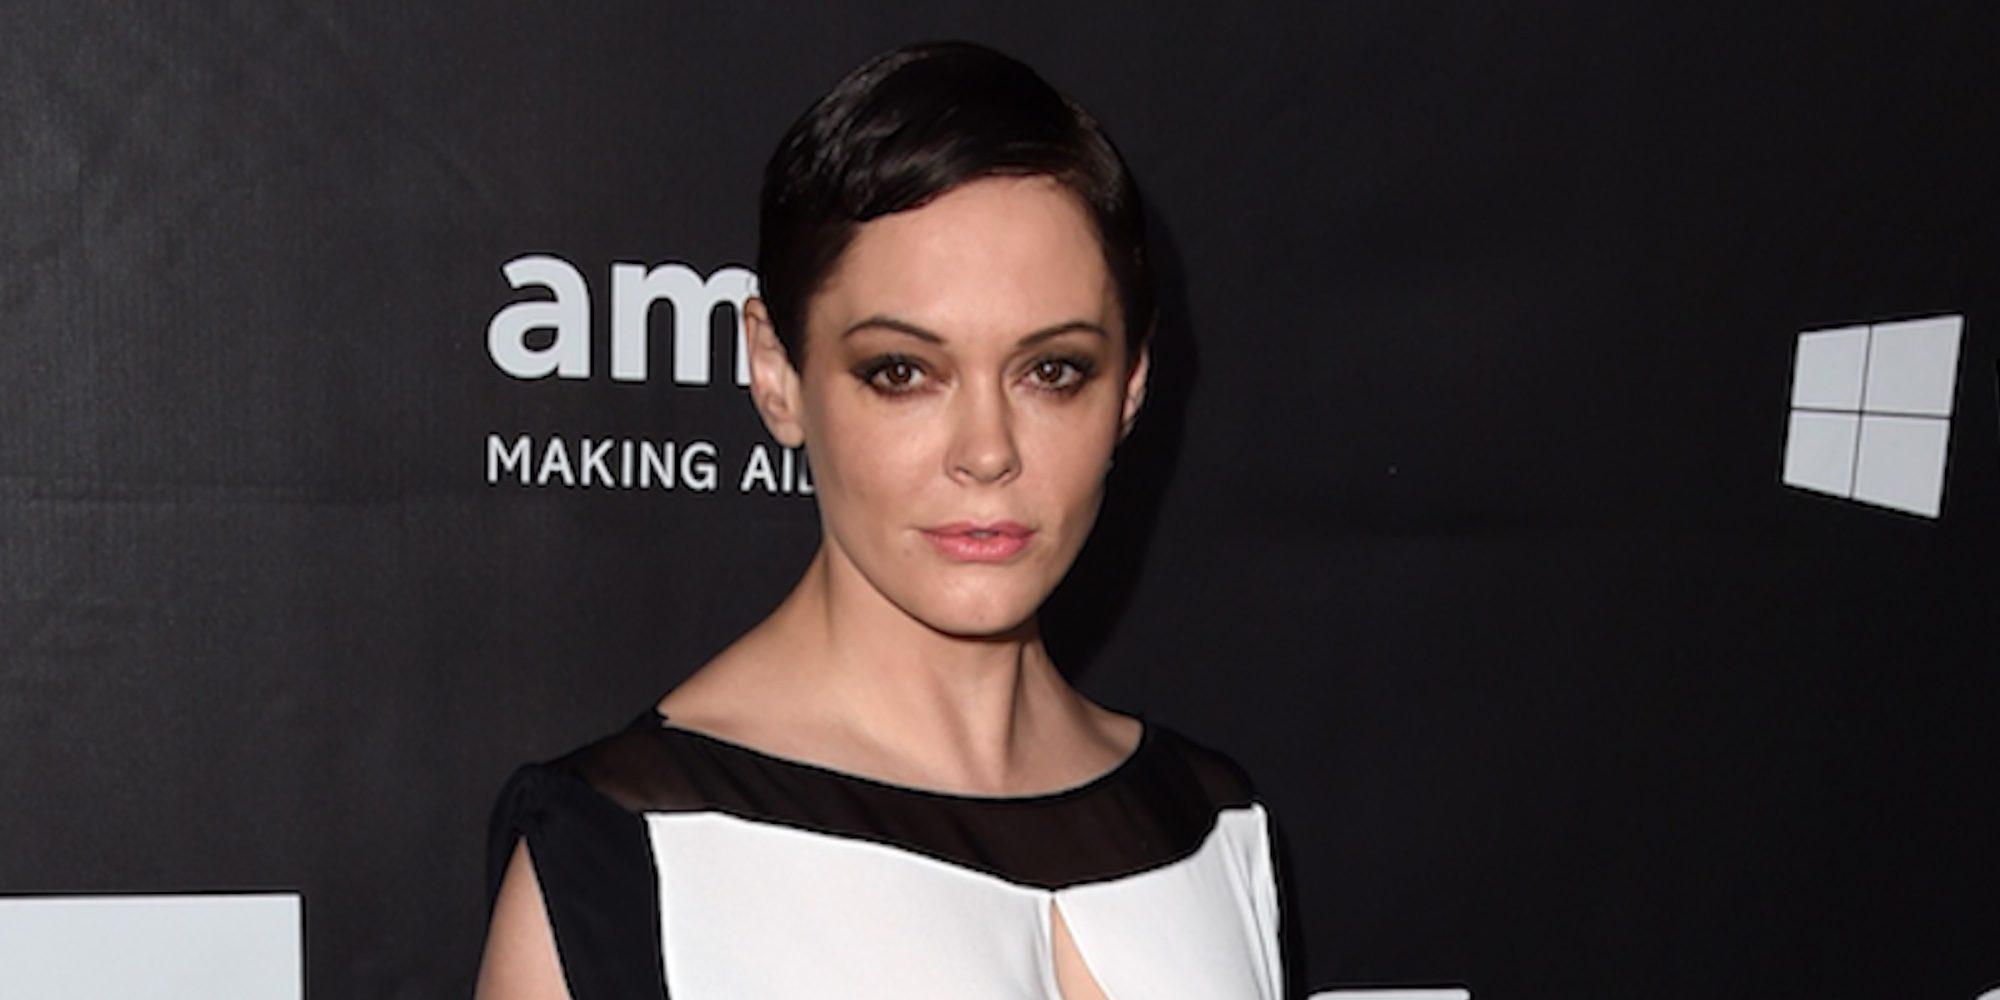 Harvey Weinstein pagó 100.000 dólares a Rose McGowan para que no revelara sus abusos sexuales